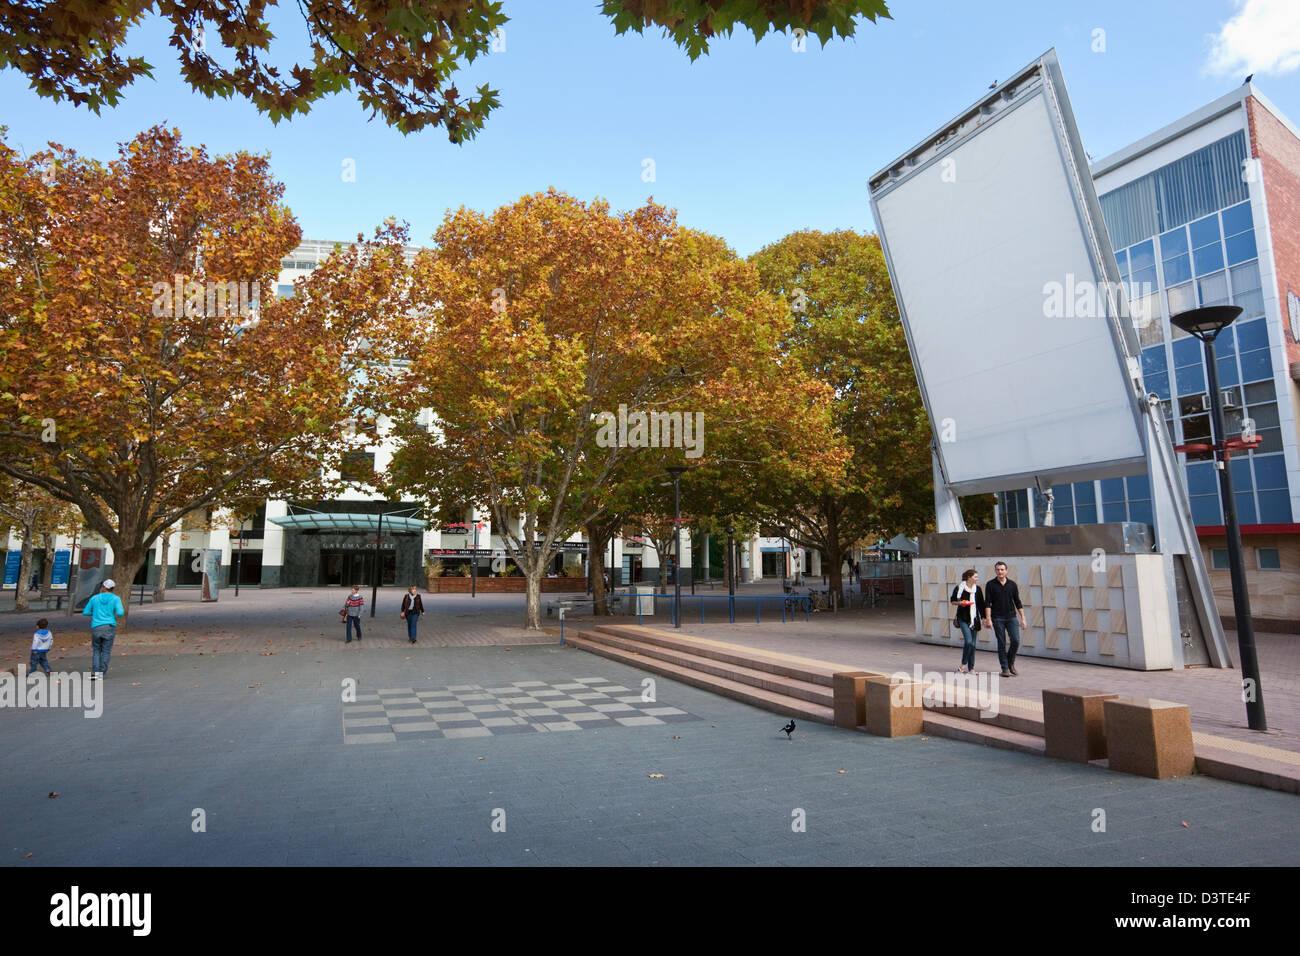 Garema Place. Civic, Canberra, Australian Capital Territory (ACT), Australia - Stock Image